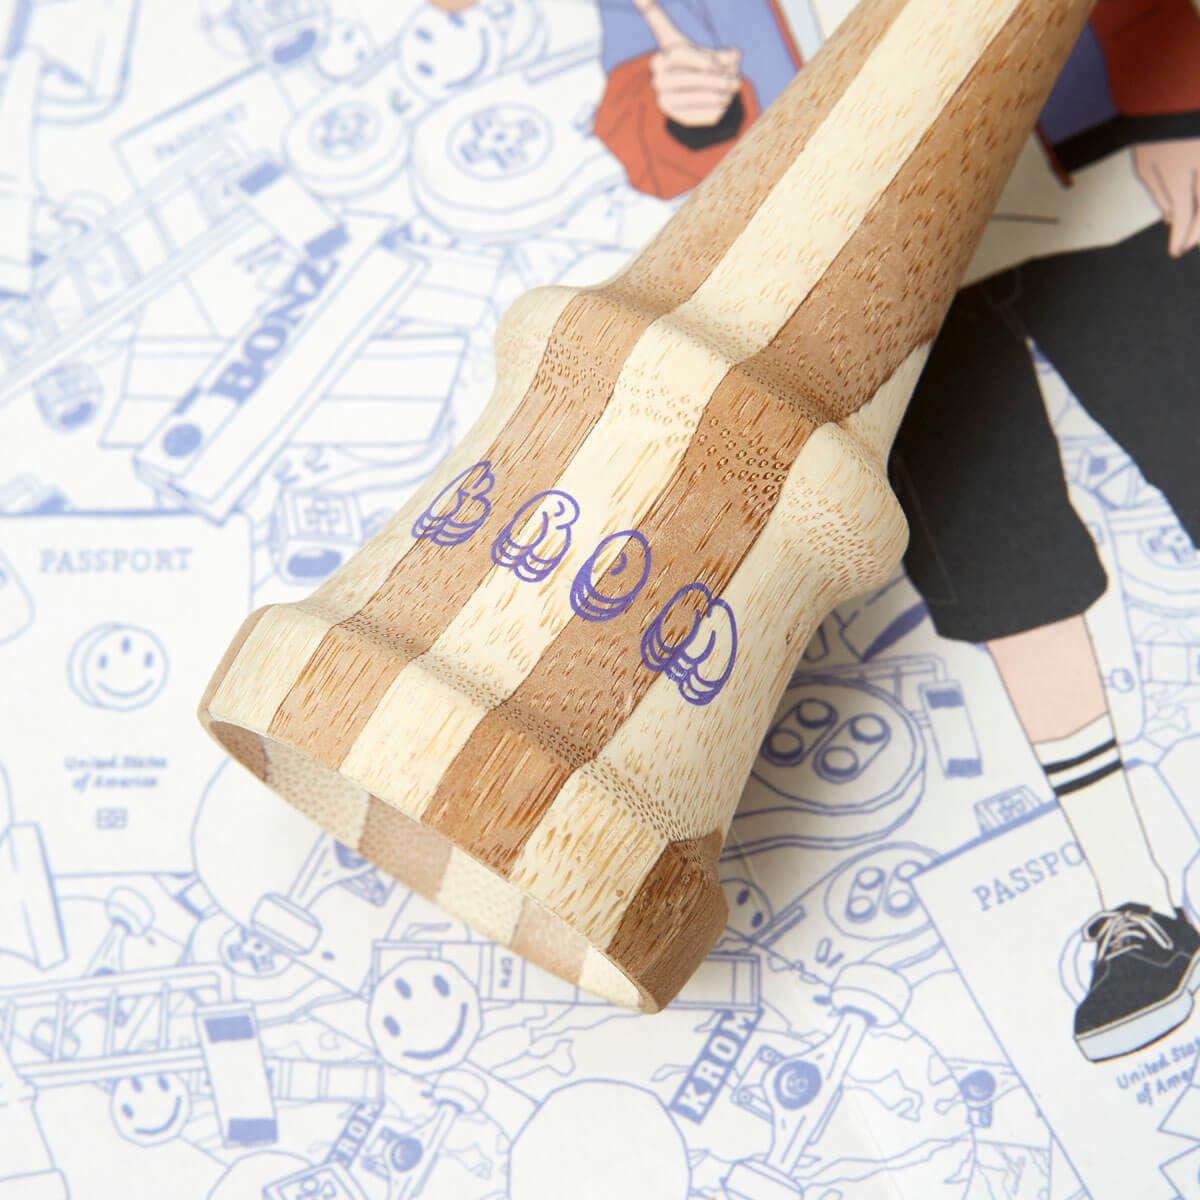 krom-pro-bamboo